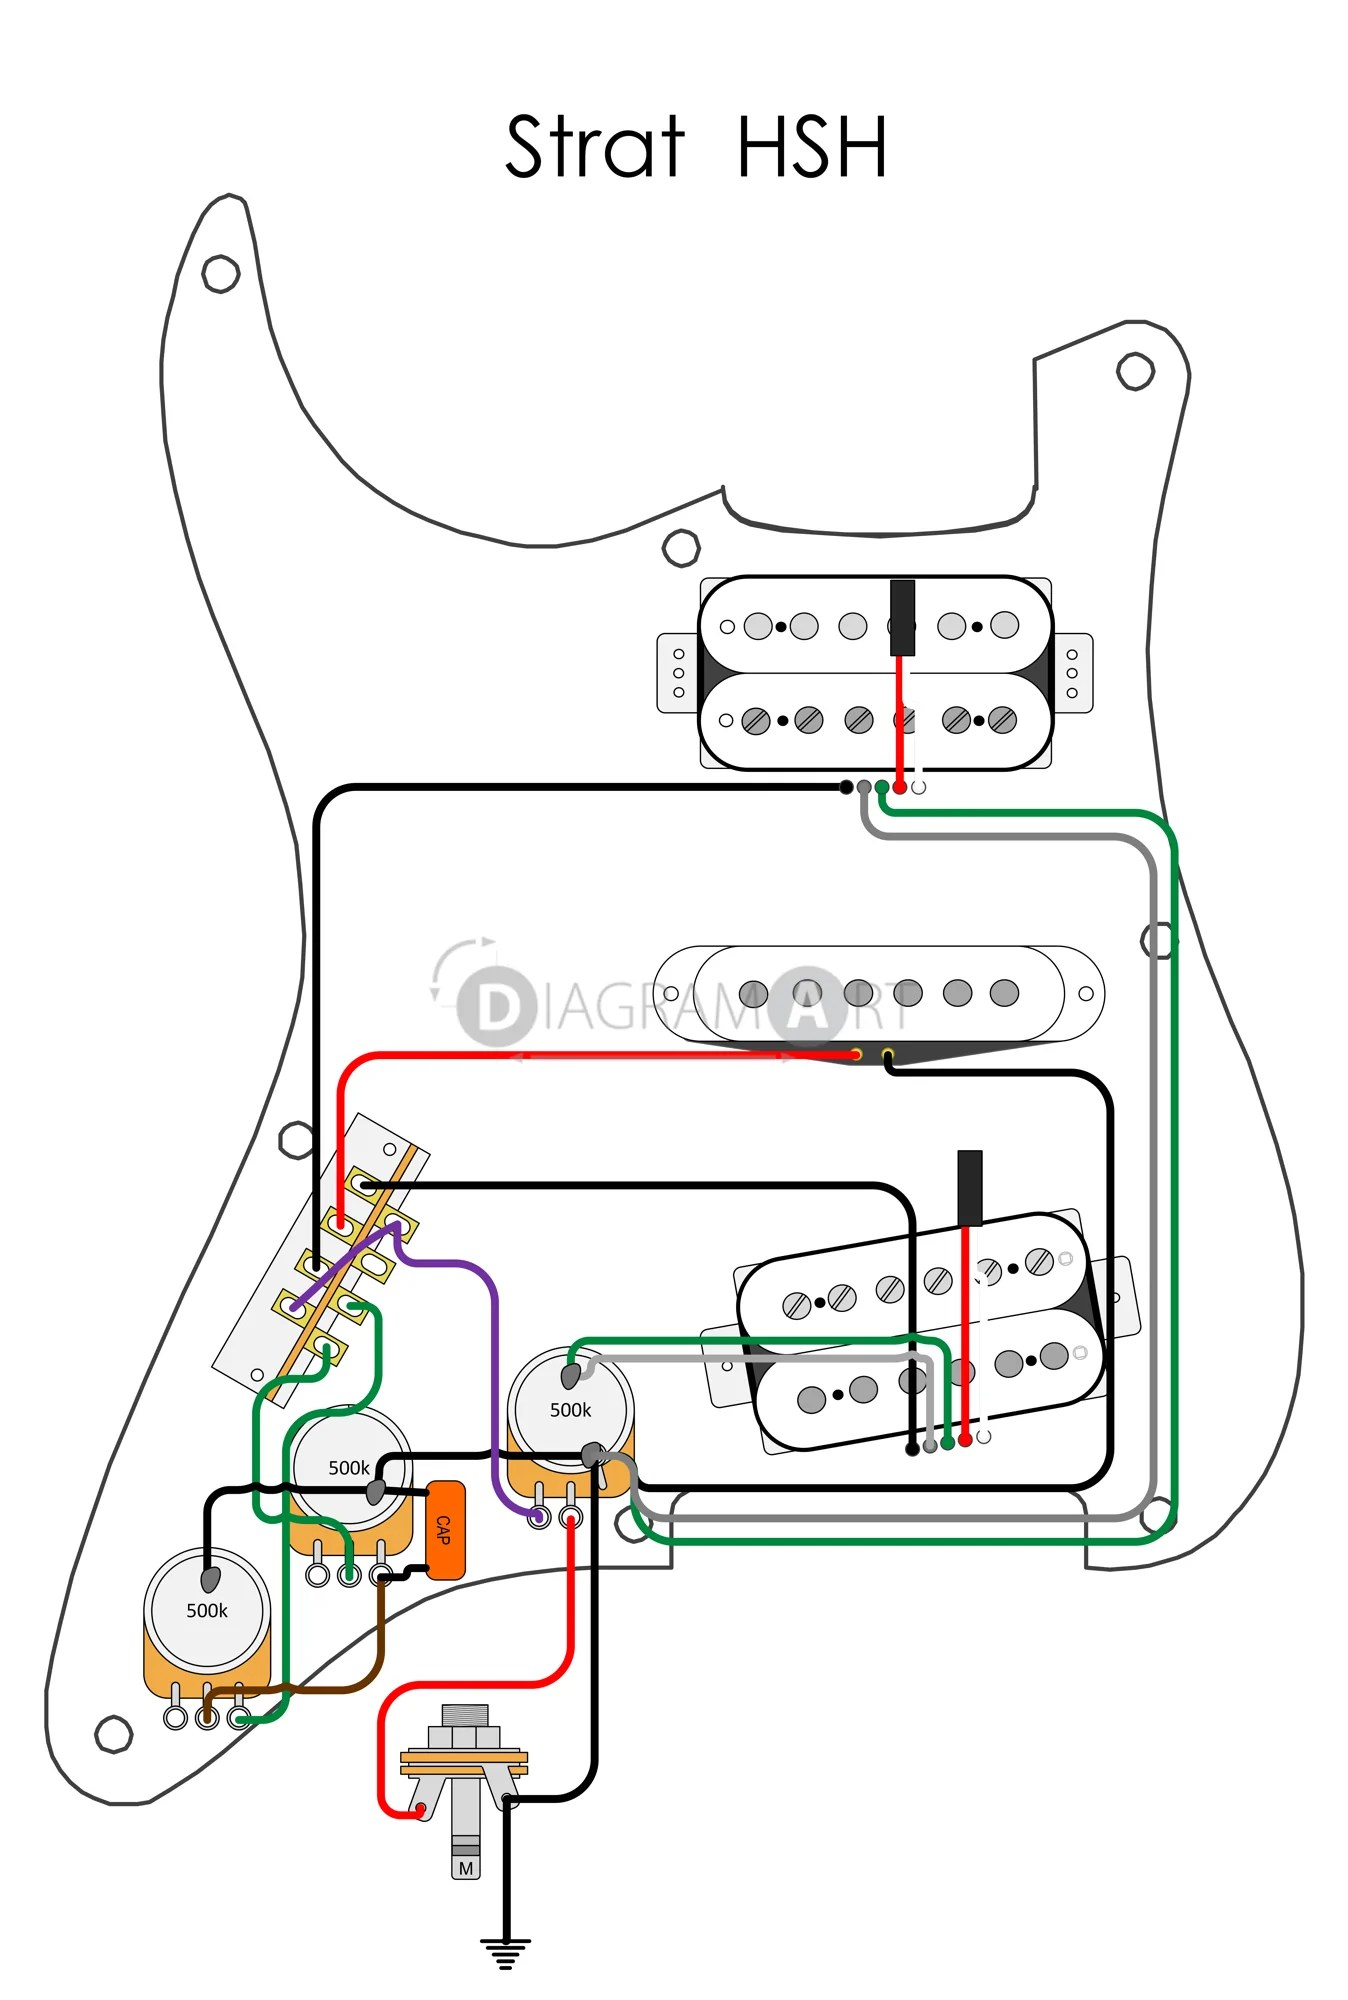 free download guitar wiring diagrams diagram jem simple wiring schema friendship bracelet diagrams hs wiring diagram [ 1348 x 2000 Pixel ]